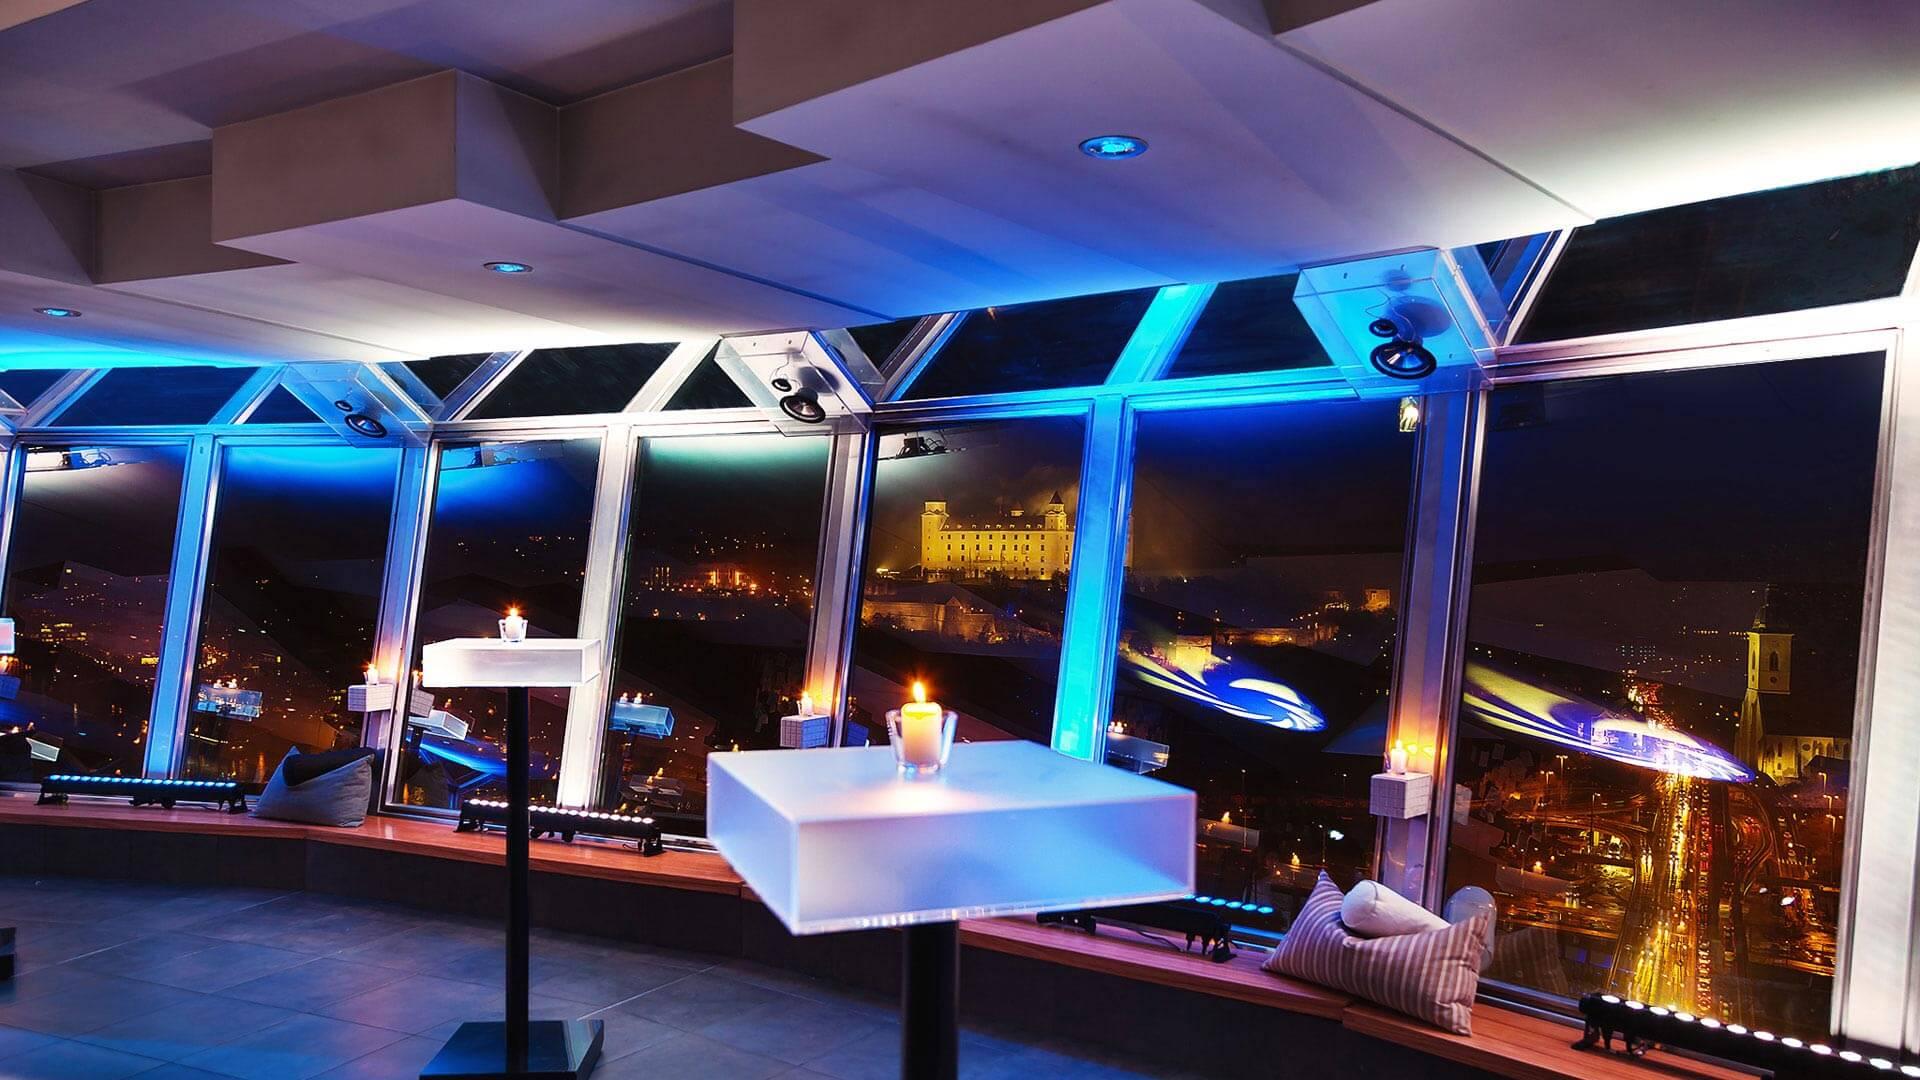 Riesenie Ozvucenia UFO restaurant - MediaTech